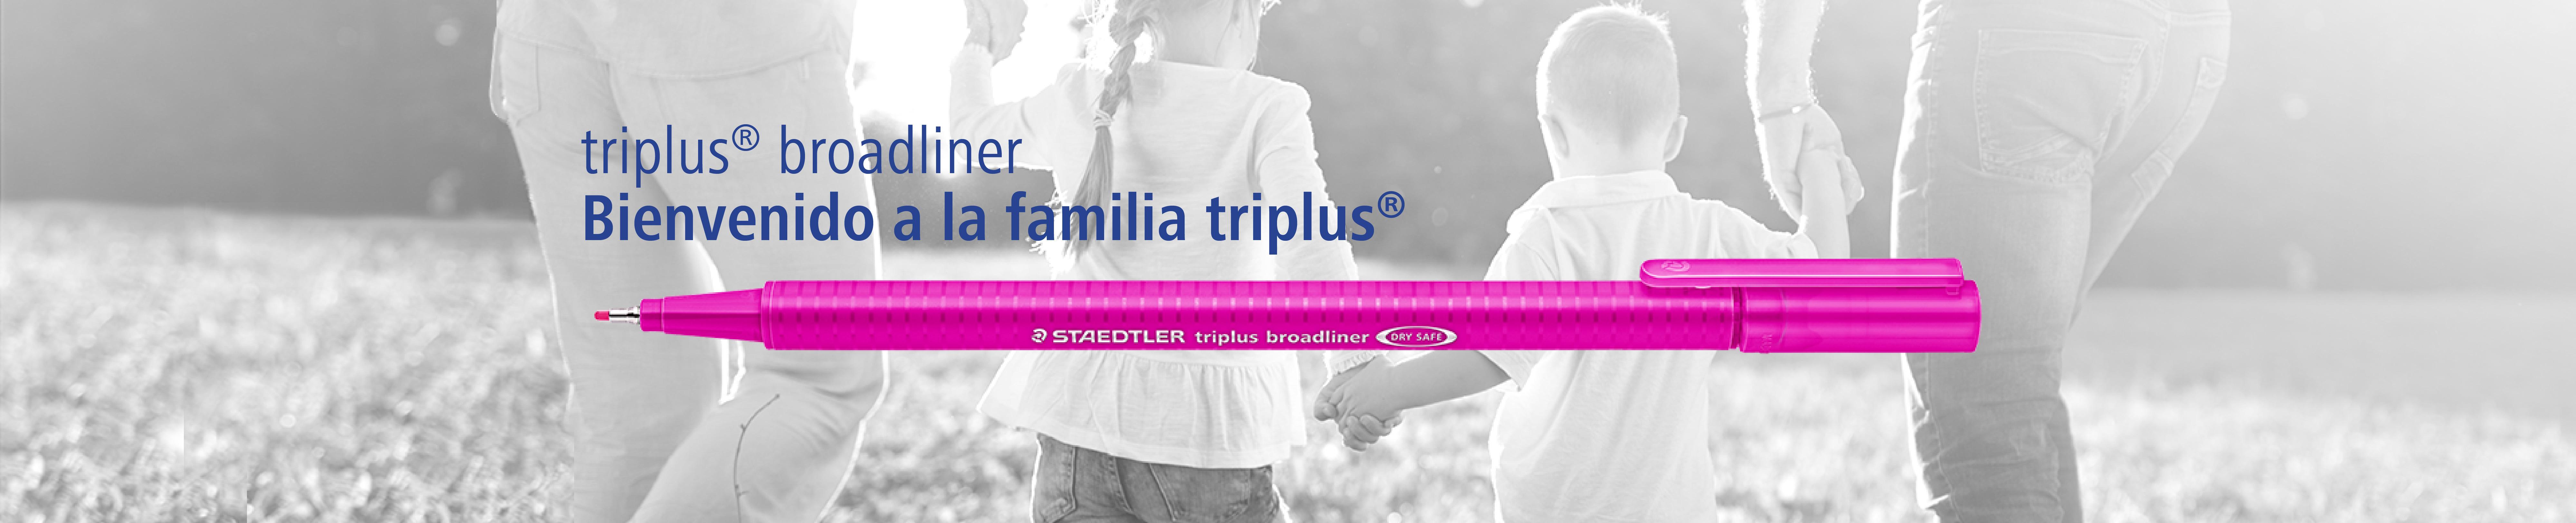 Staedtler TRIPLUS NOVIEMBRE 2018